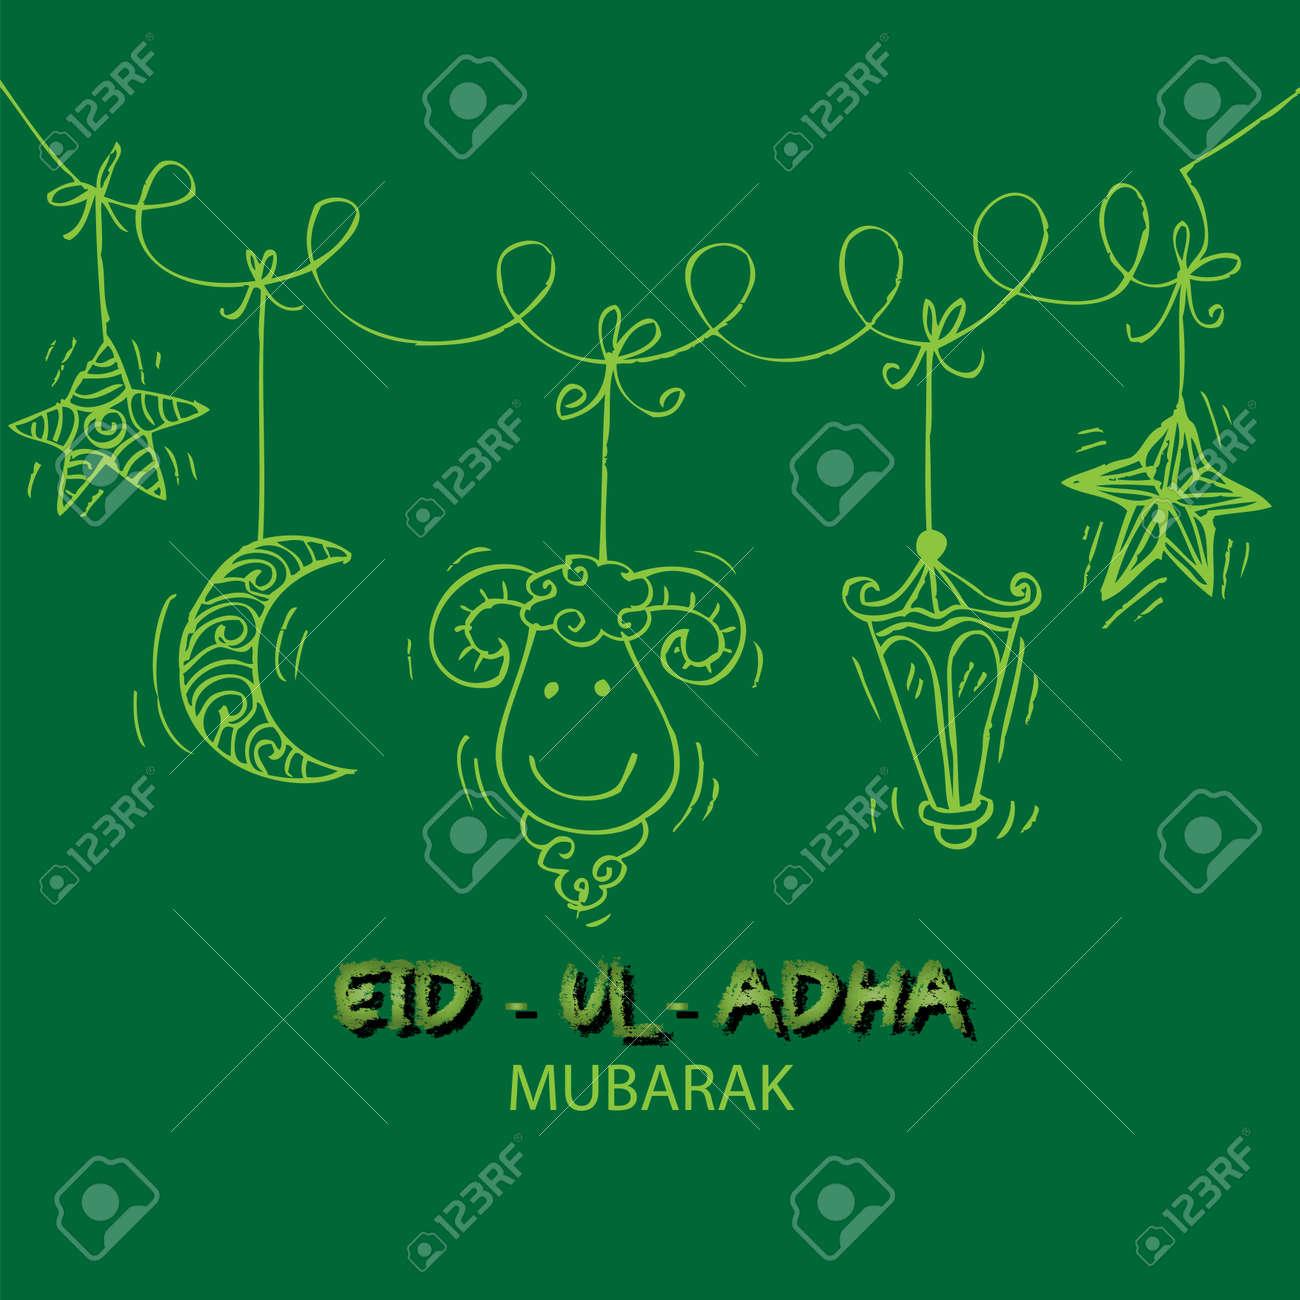 Eid Ul Adha Greeting Cards Images Labzada Wallpaper